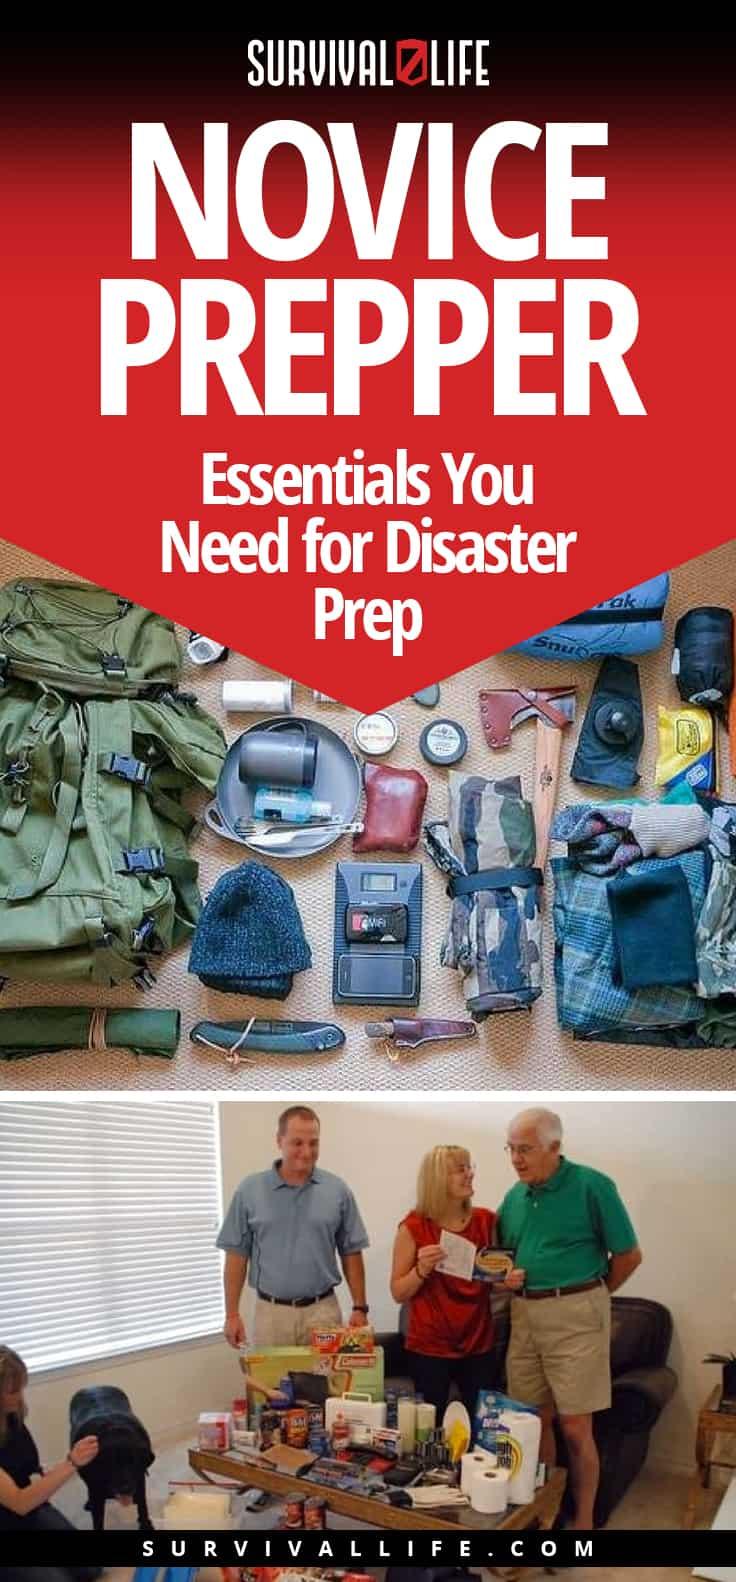 Pinterest Placard | Novice Prepper: Essentials You Need for Disaster Prep | Shtf Preppers